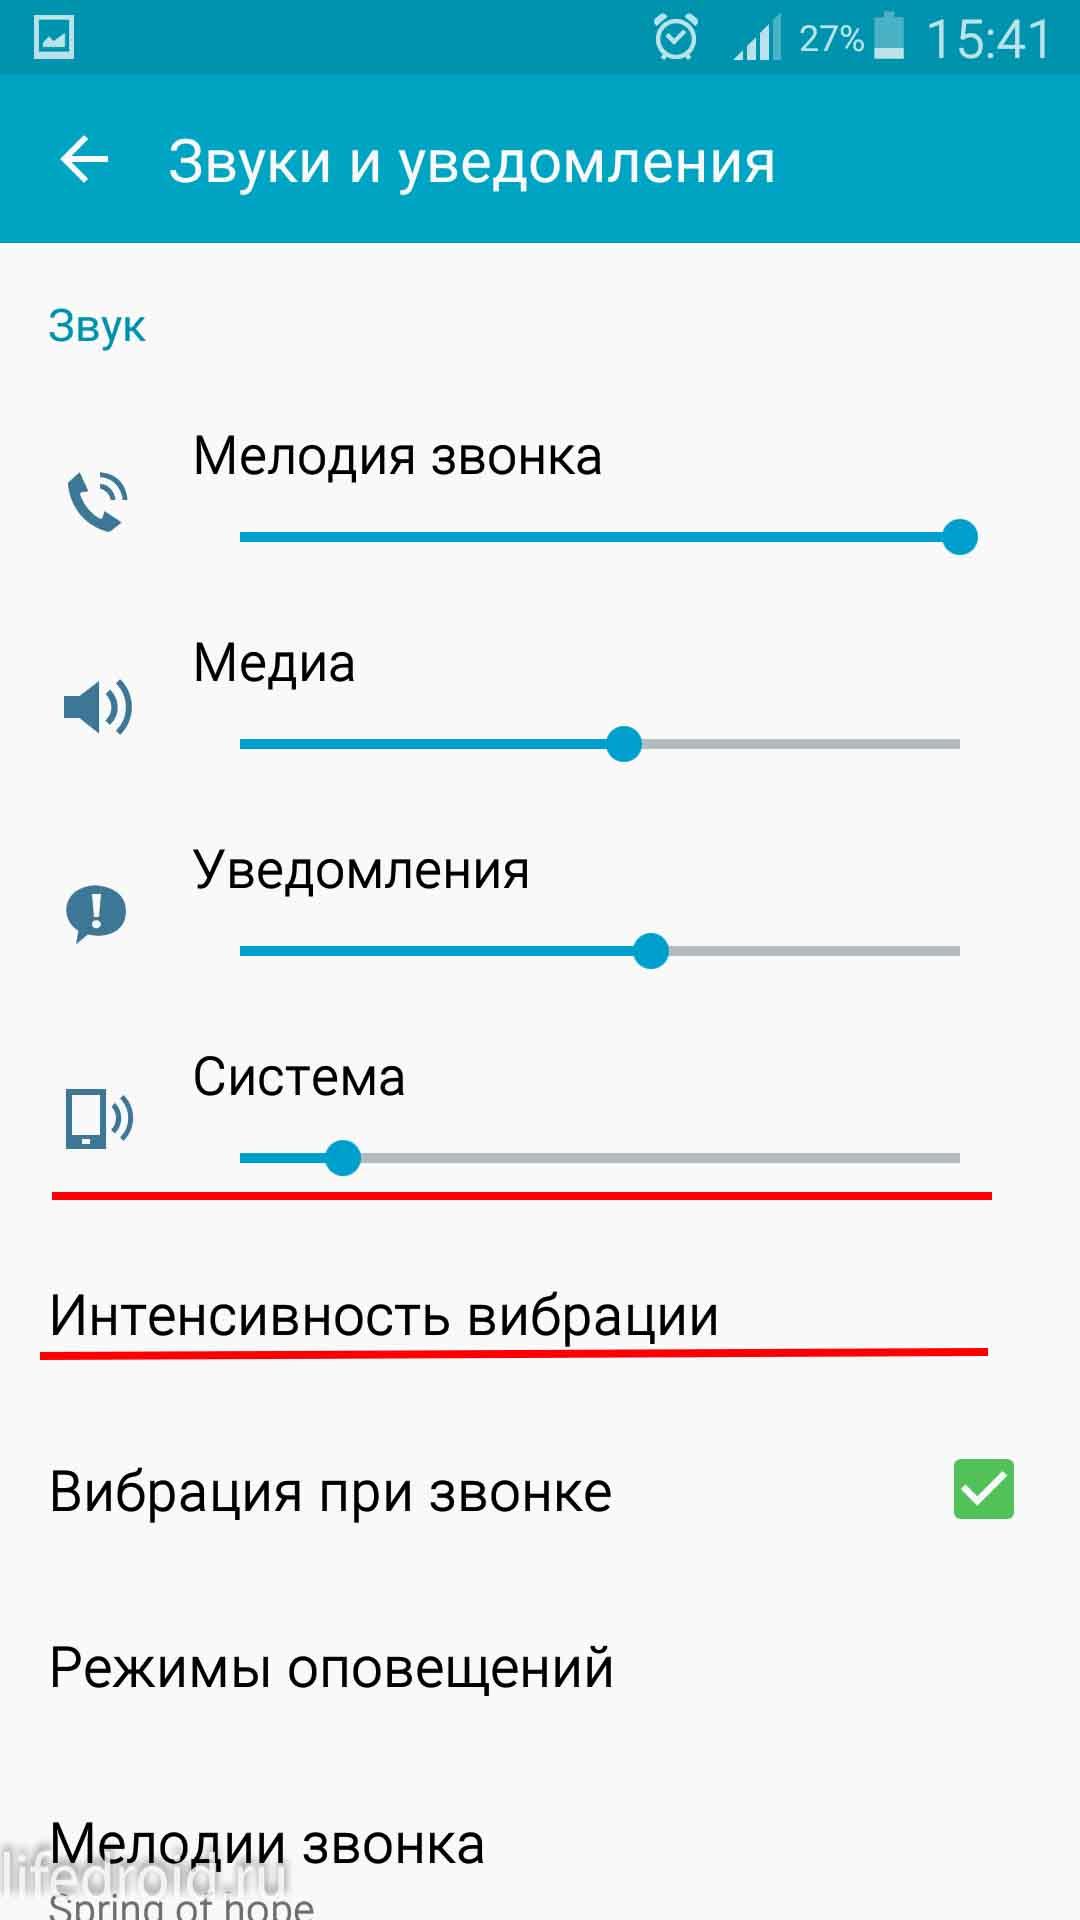 Как отключить звук клавиатуры на Андроиде